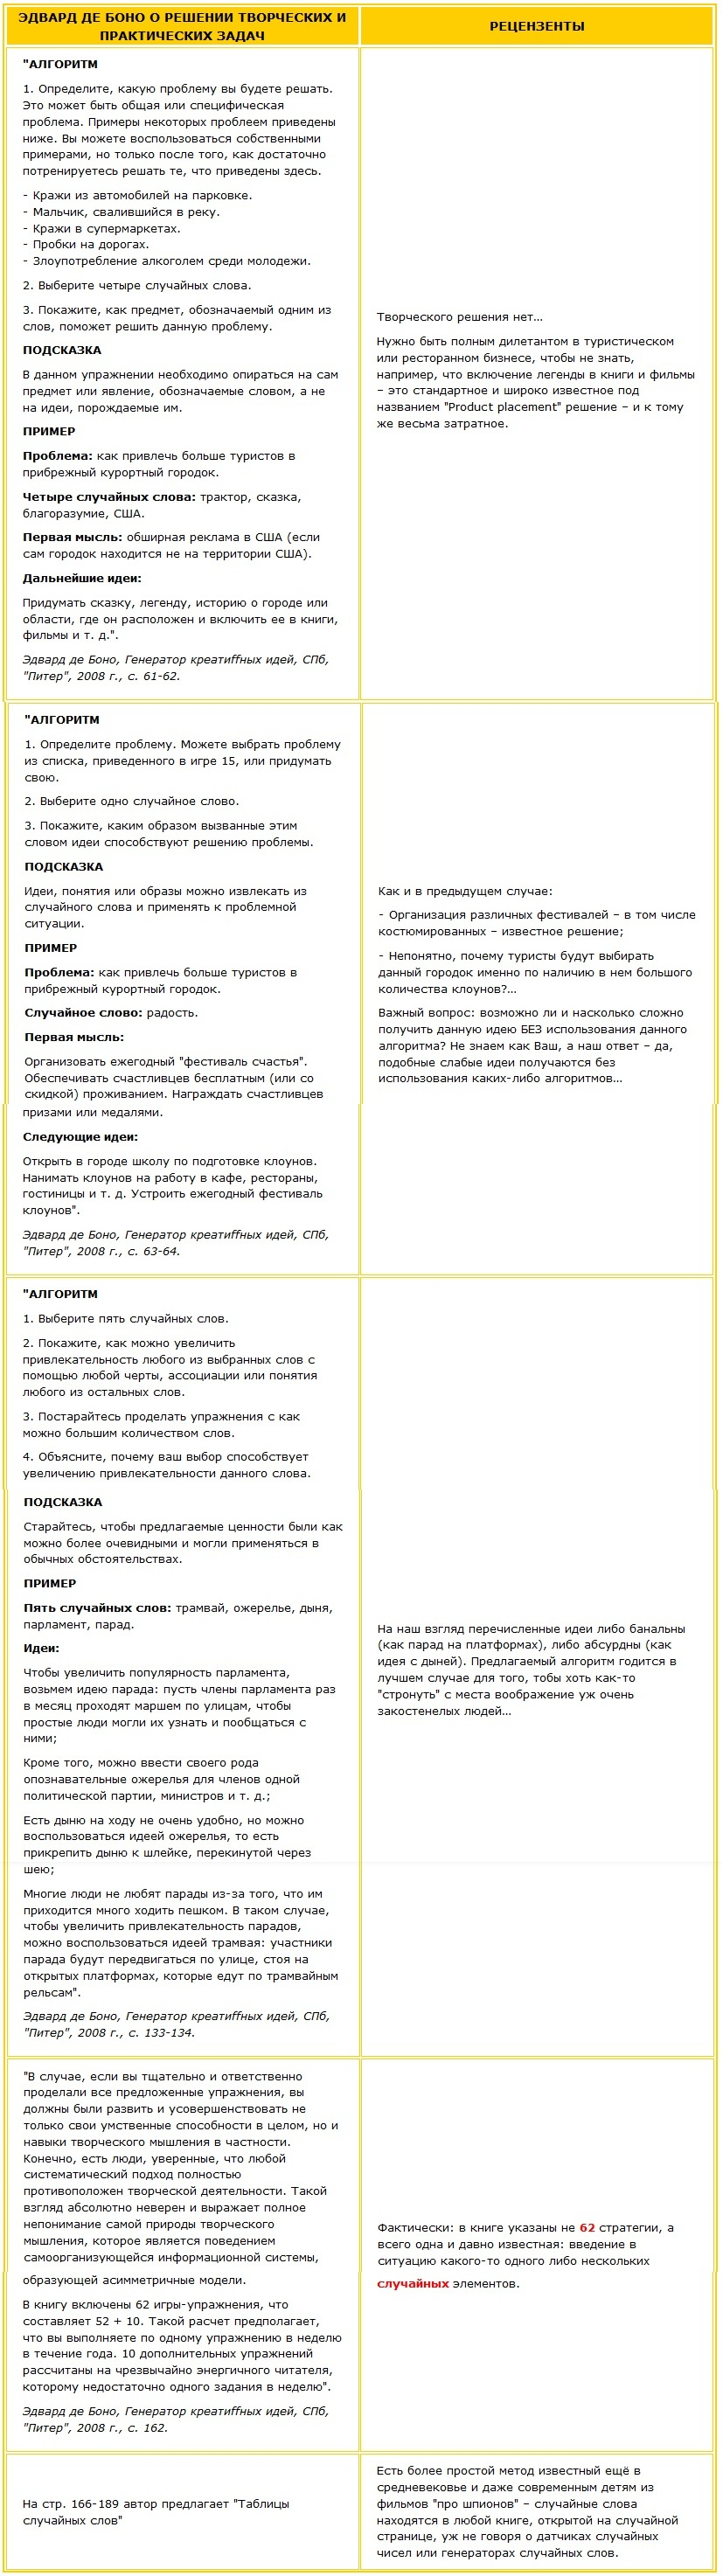 Таблица: Эдвард де Бон о решении творческих задач - рецензия